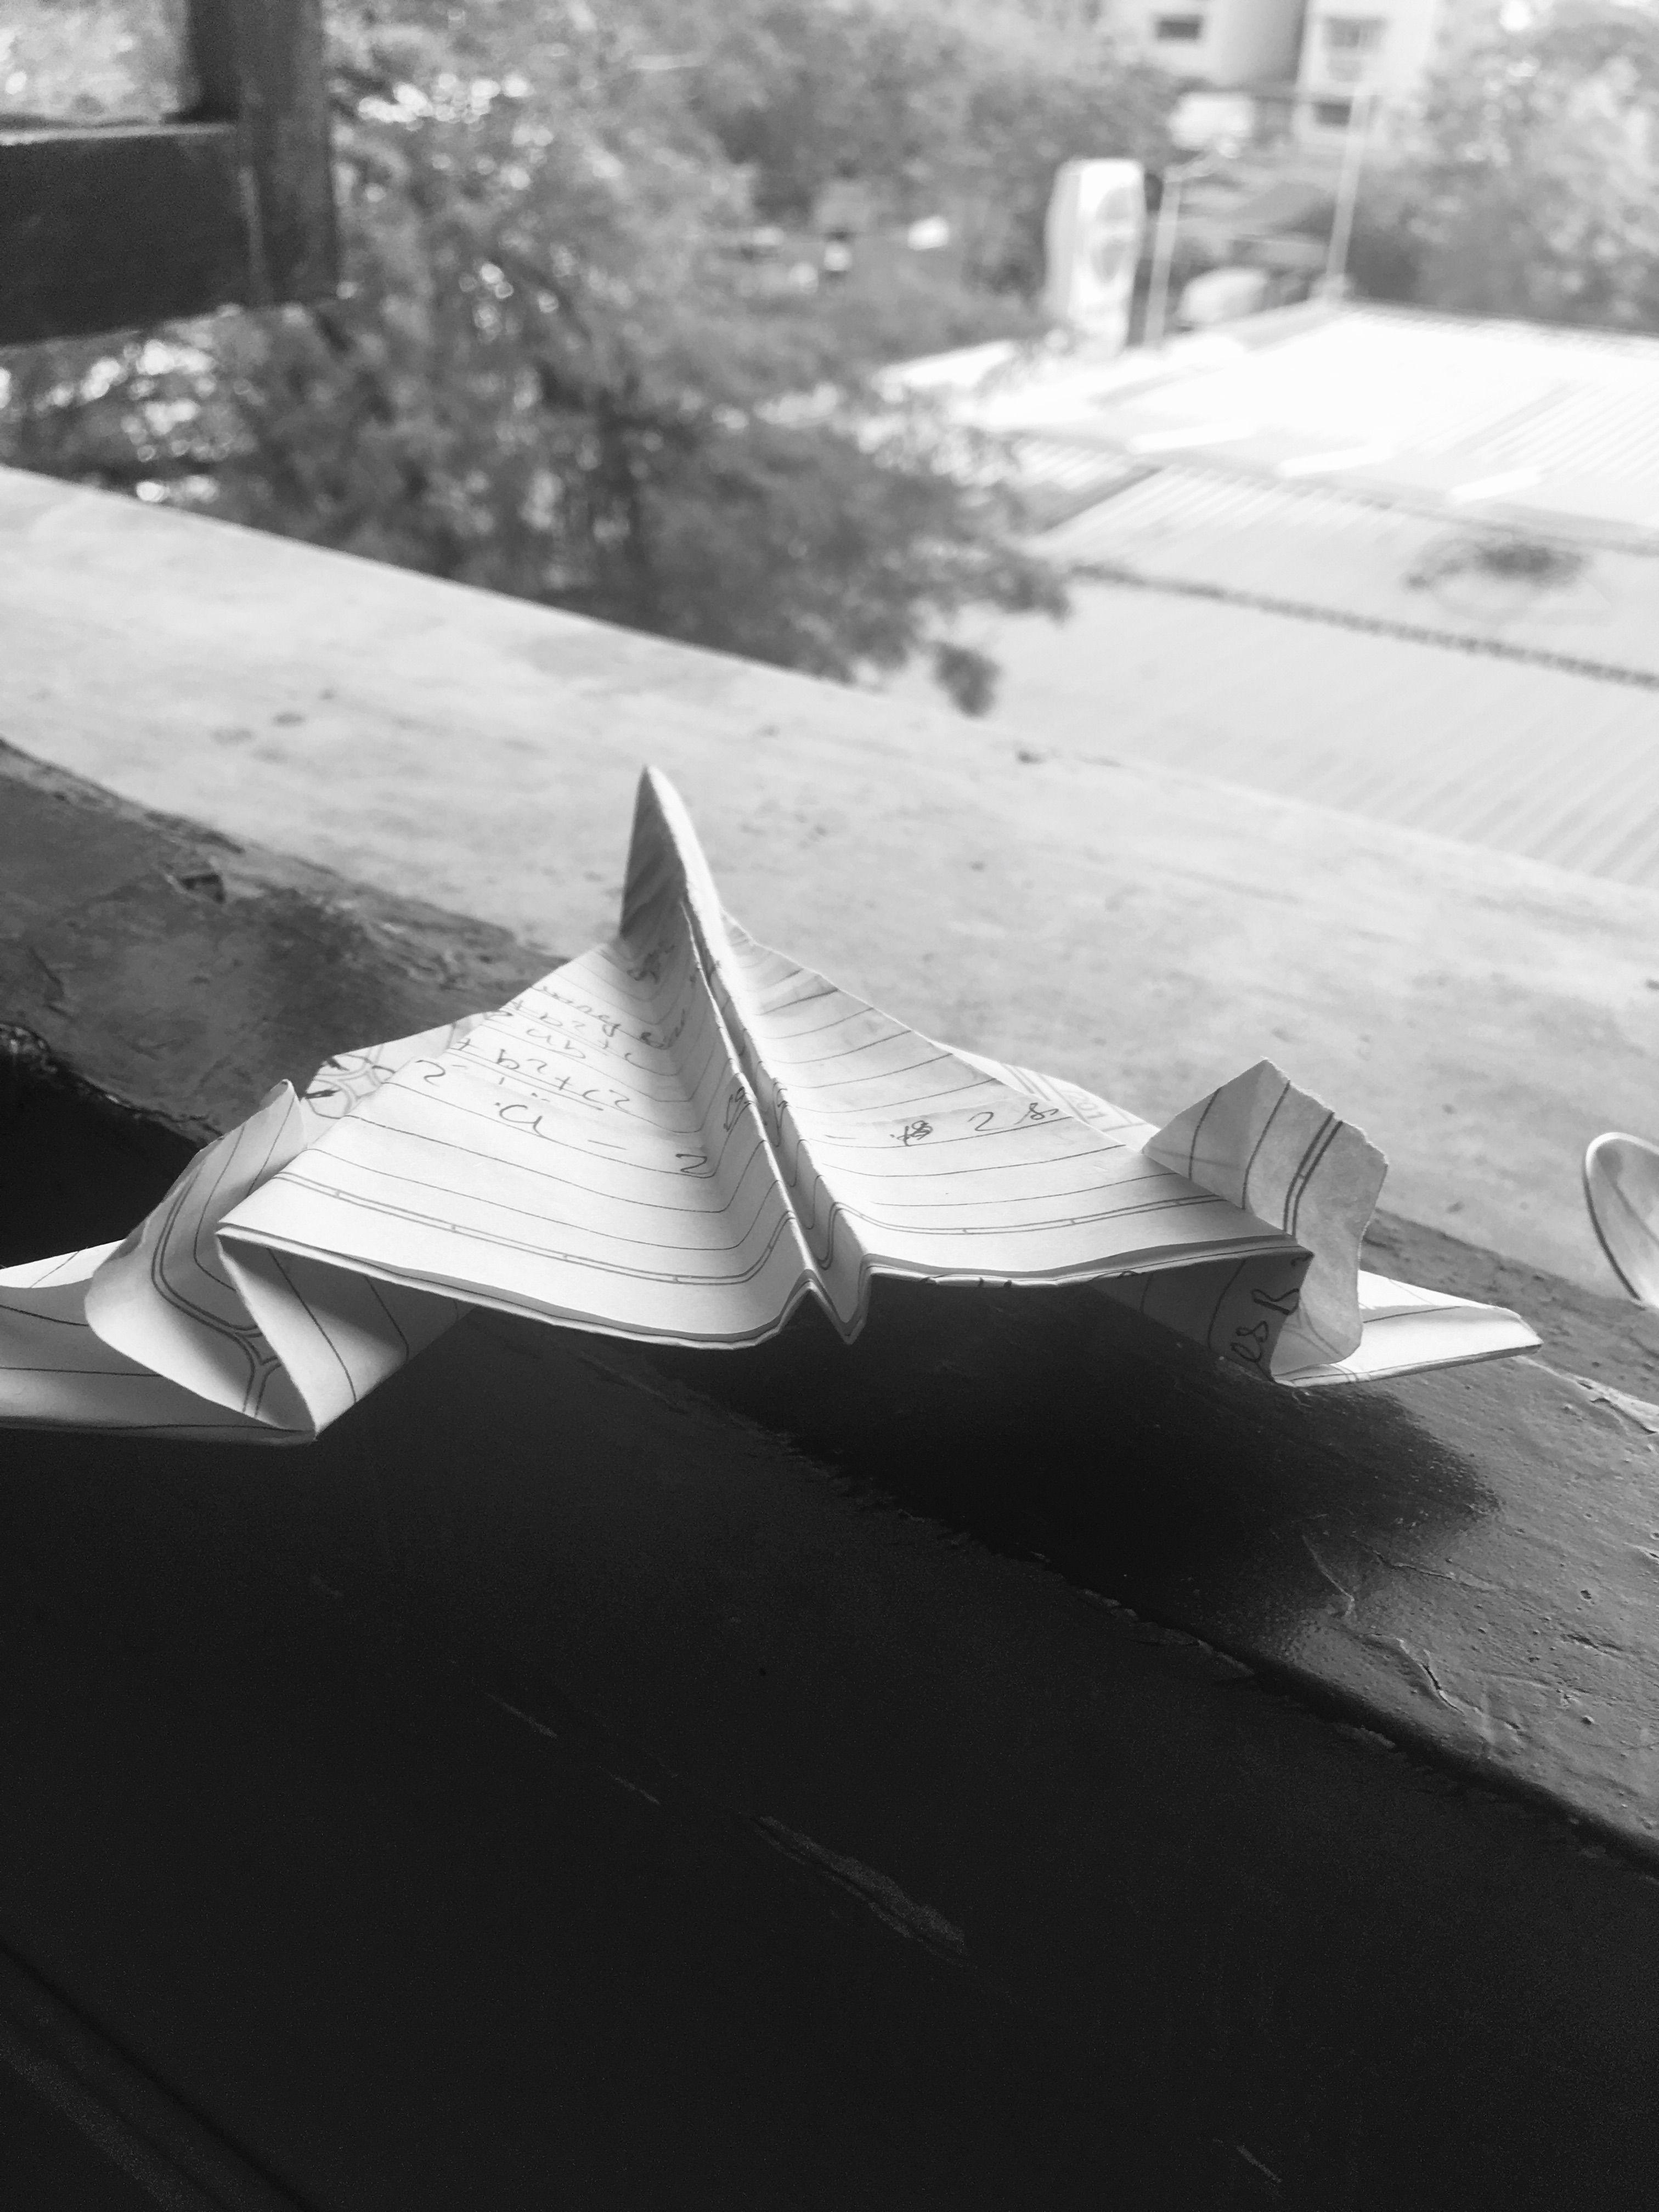 #origami #fashion # #wallpaper #wallpaperiphone #originalart #origamiart #origamicrafts #wallpaperforyourphone  #boys #girllifehacks #pinterest #instagram #follow4follow #like4like #save